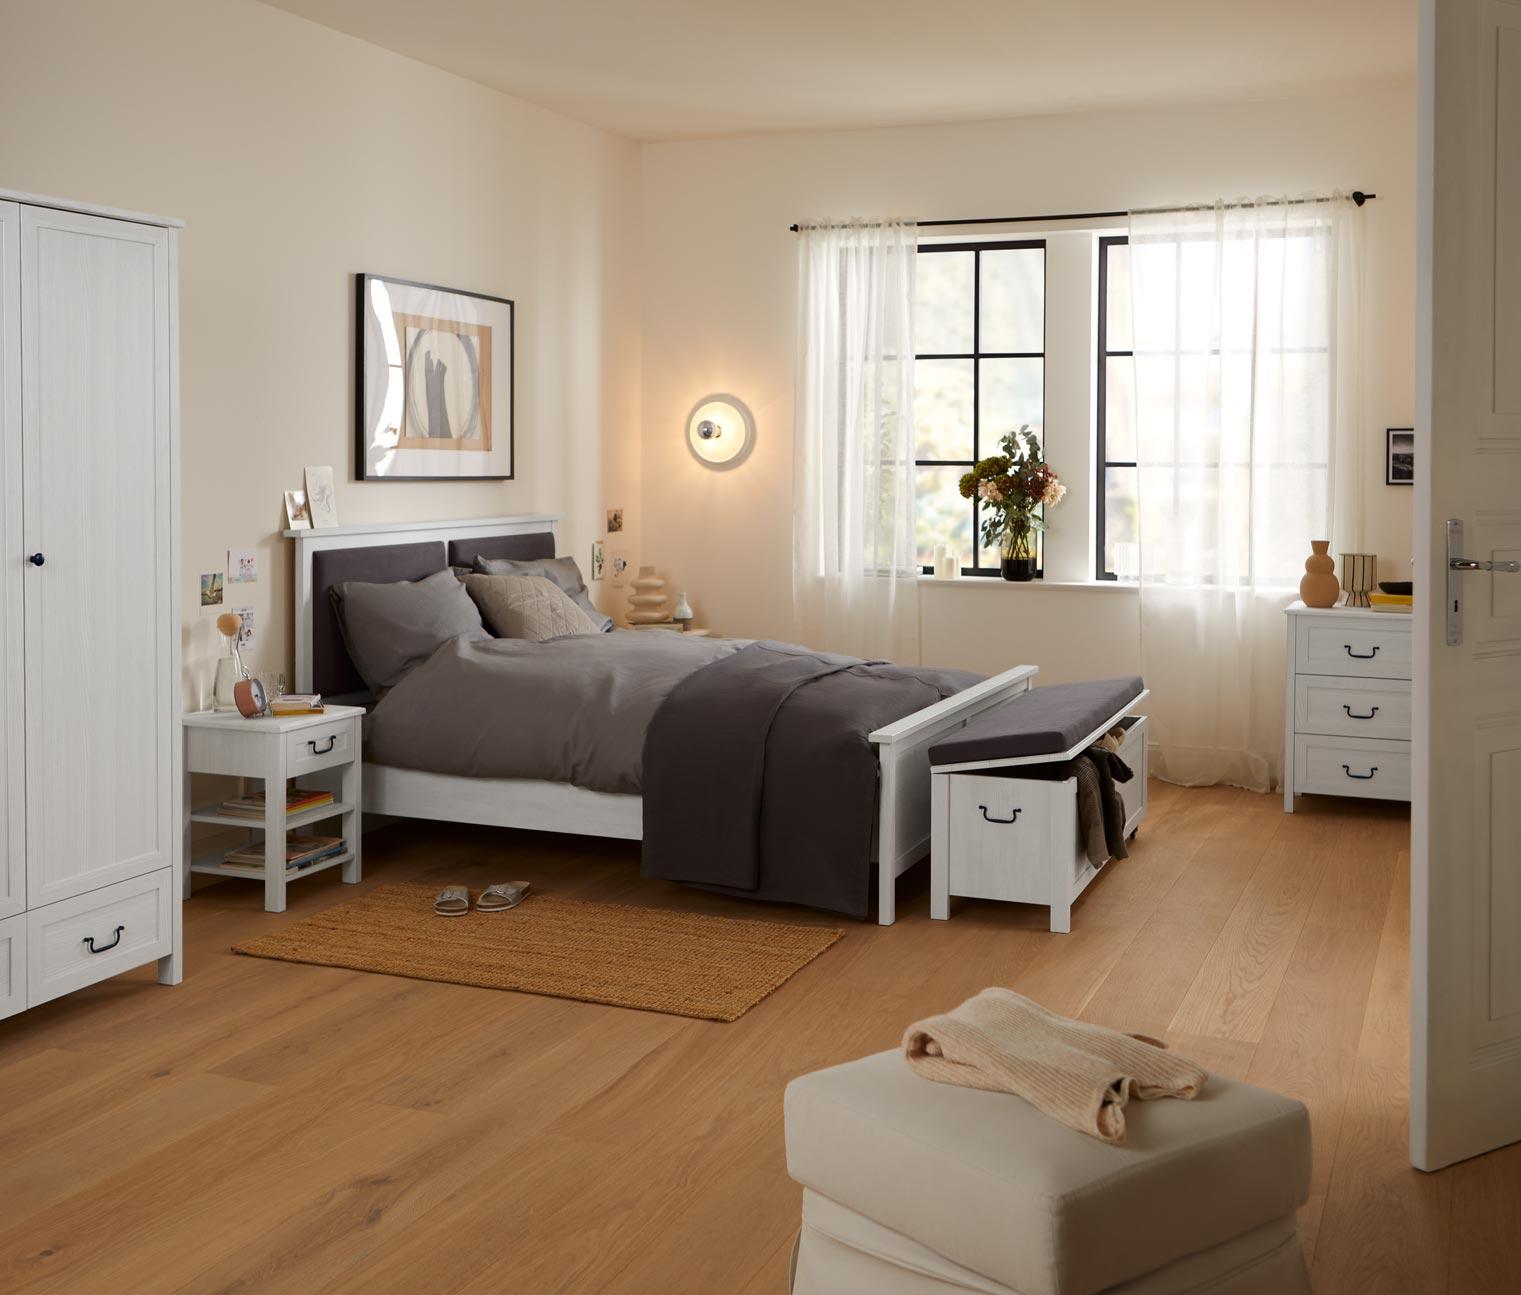 Image of Bett mit gepolstertem Kopfteil, ca. 160 x 200 cm